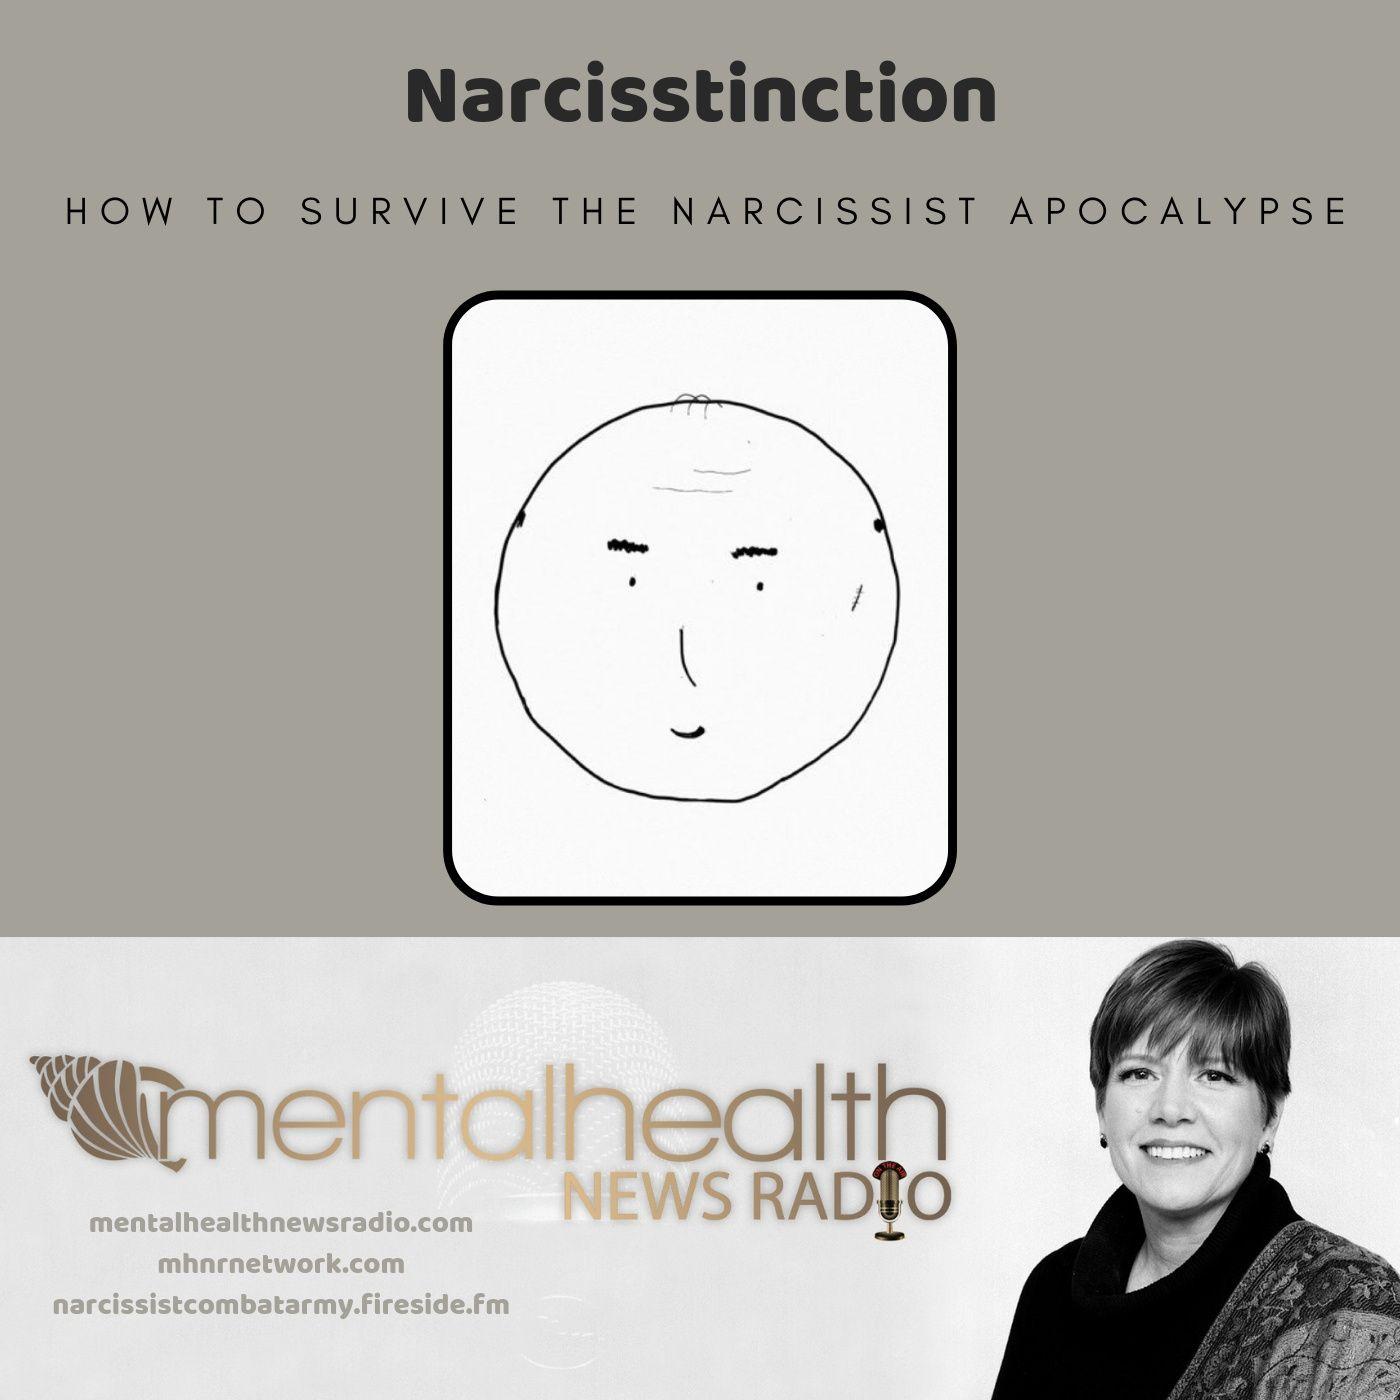 Mental Health News Radio - Narcisstinction: How To Survive The Narcissist Apocalypse